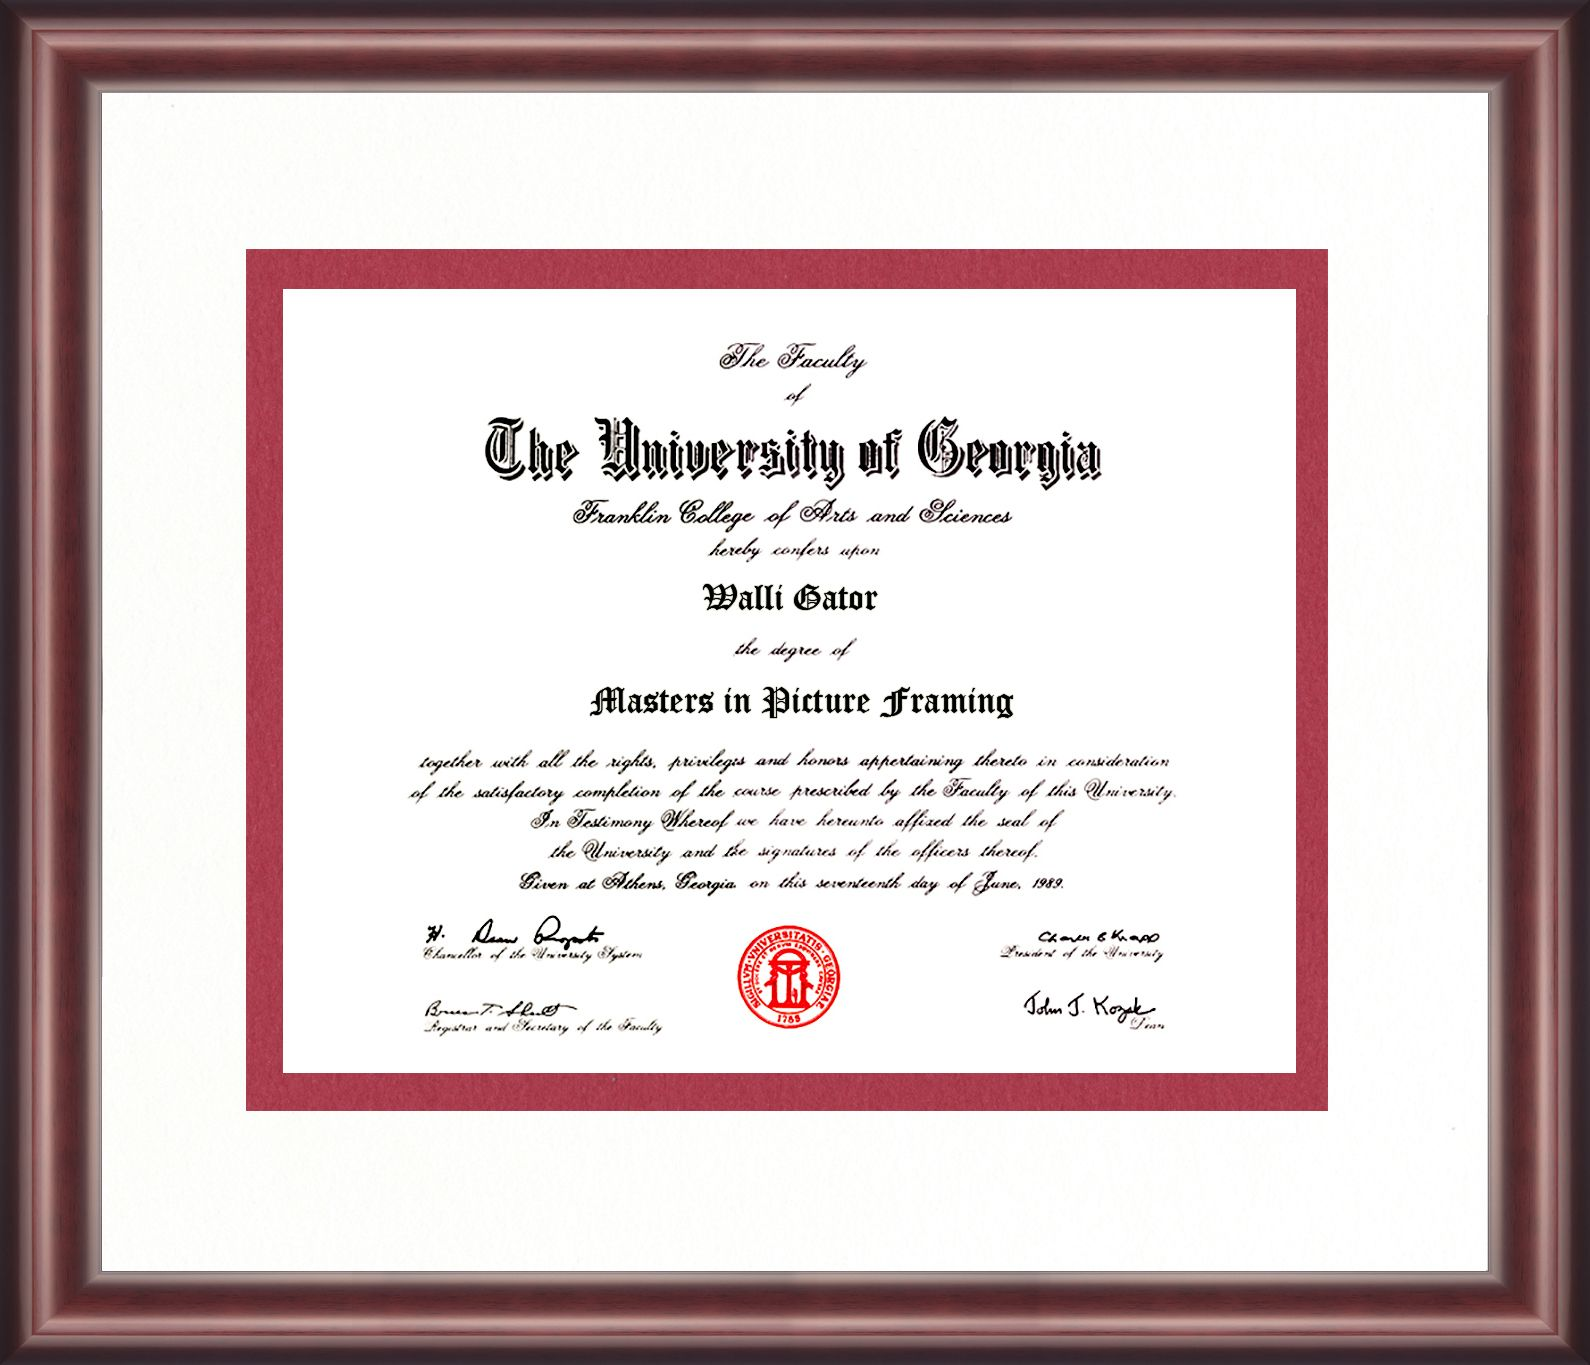 georgia university diploma frame hall seton frames talking walls graduation colors athens